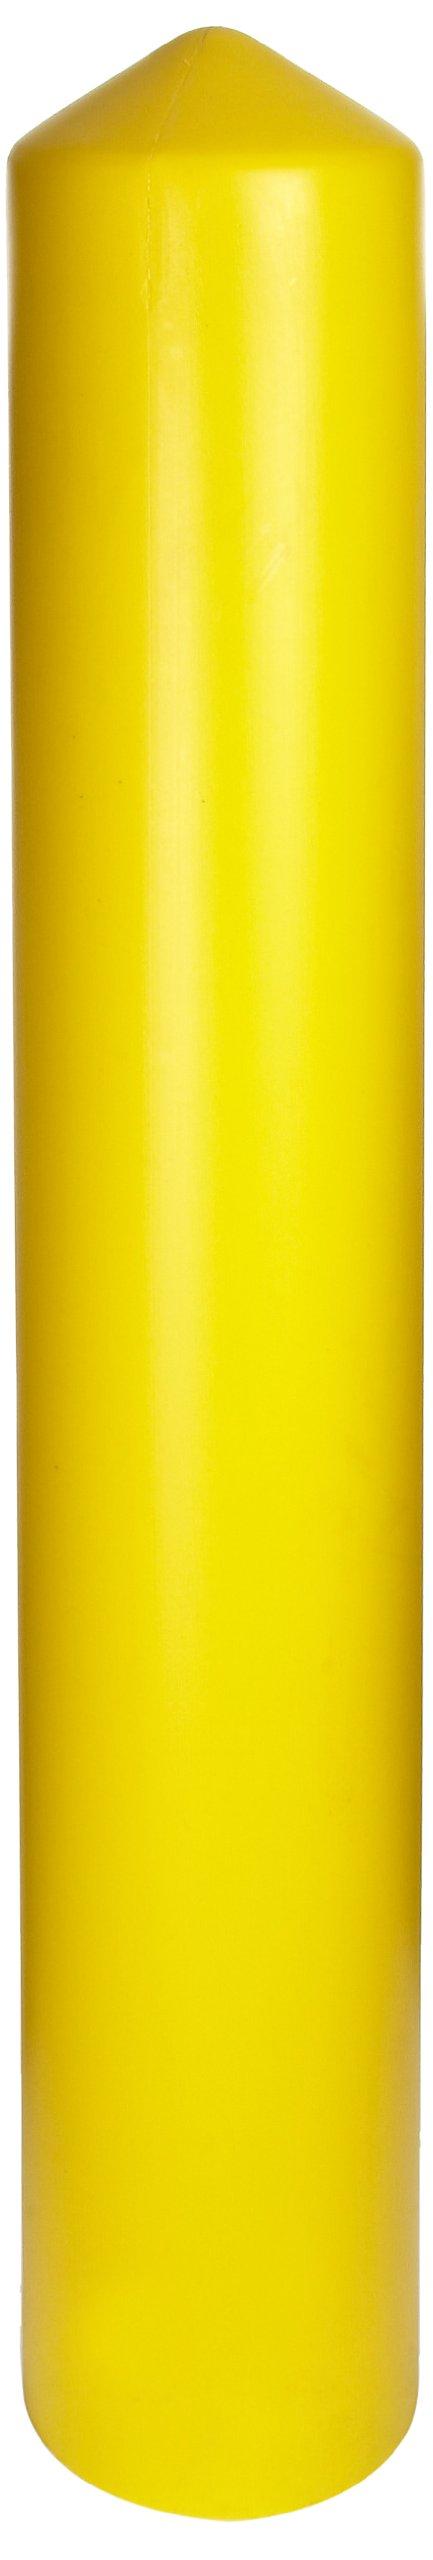 Eagle 1737 HDPE 8'' Smooth/Bollard Post Sleeve, Yellow, 9.375'' OD, 57'' Height